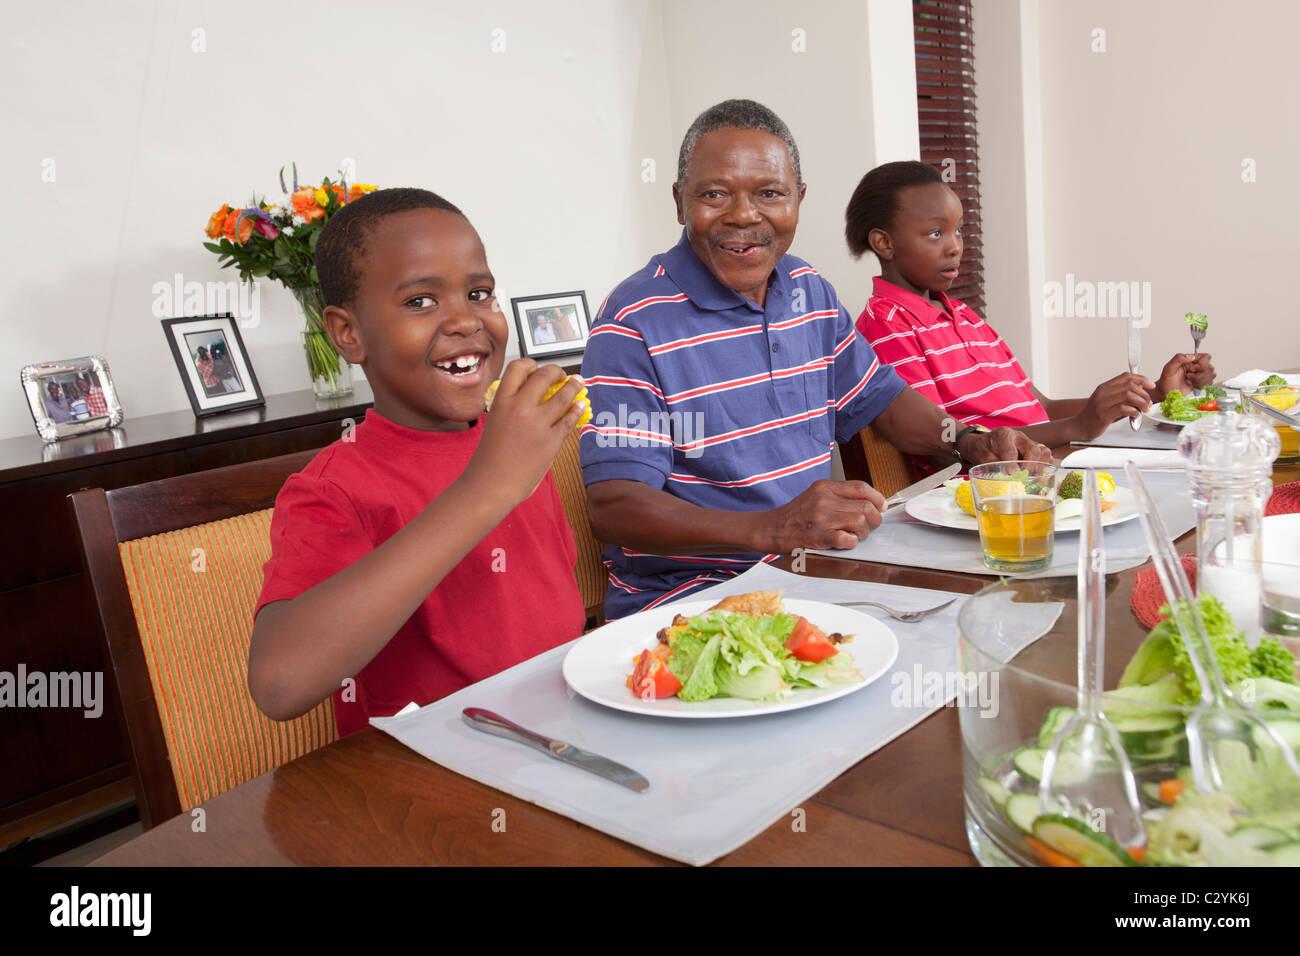 Comer en familia, mesa de comedor, Johannesburgo, Sudáfrica Imagen De Stock